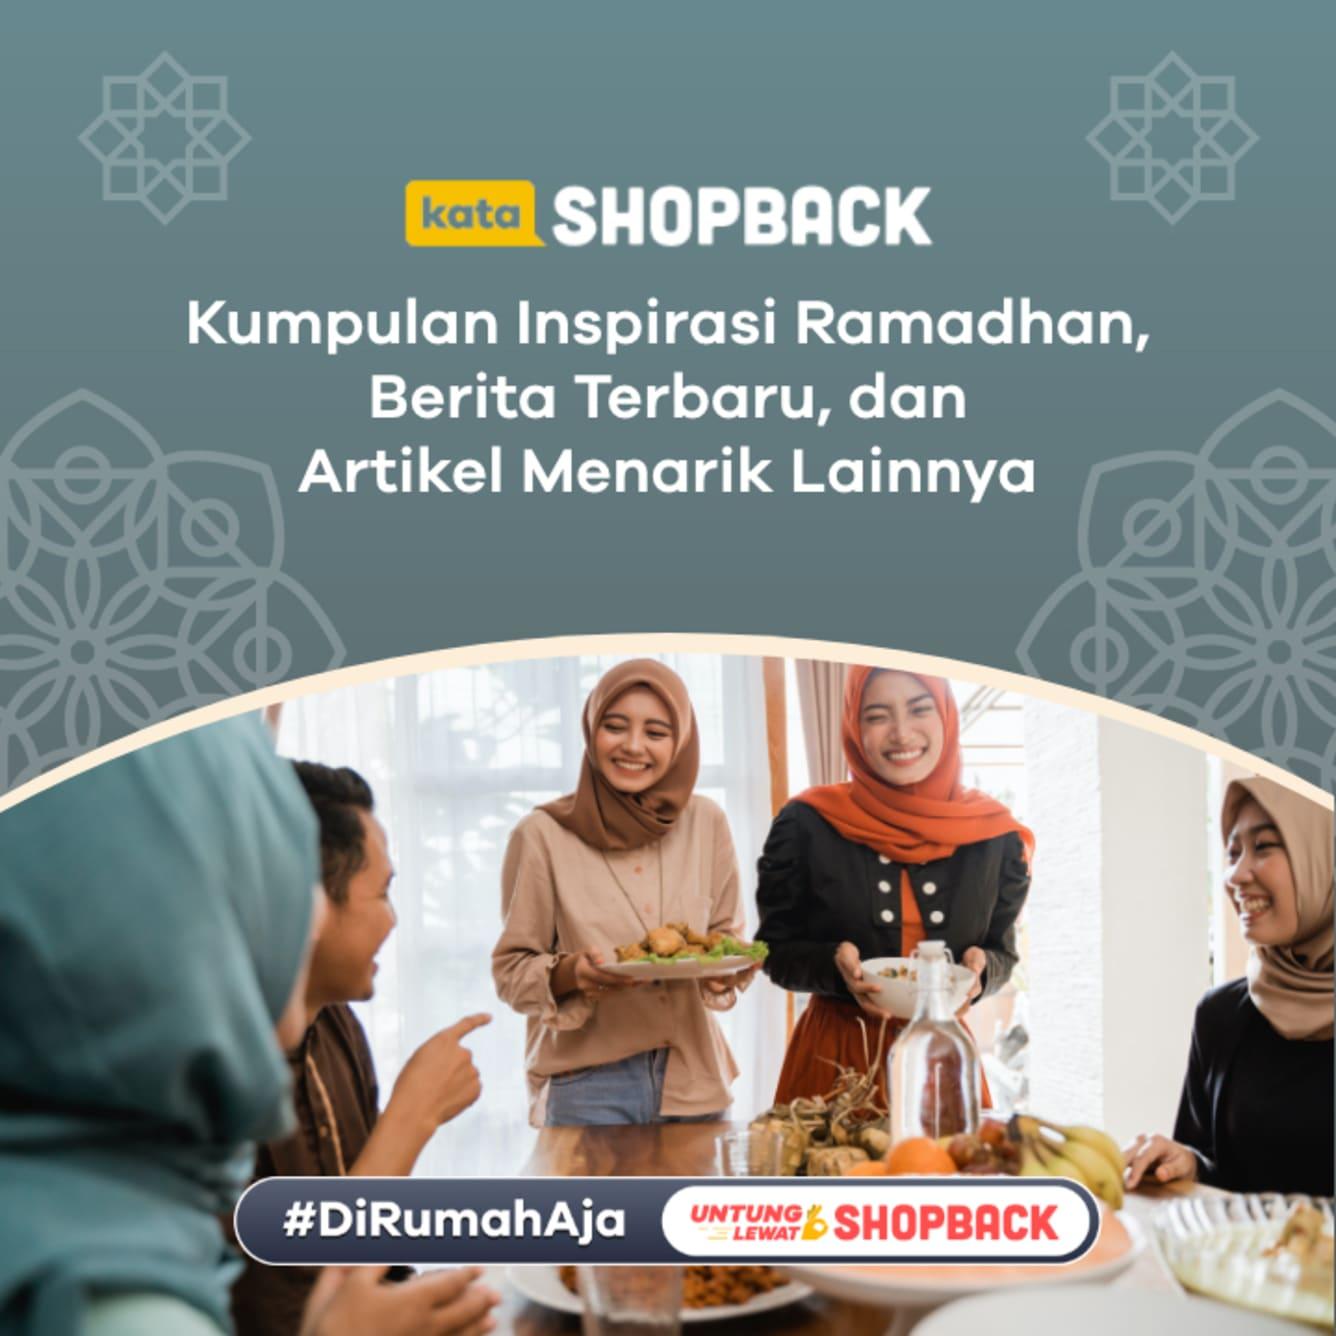 Kata ShopBack